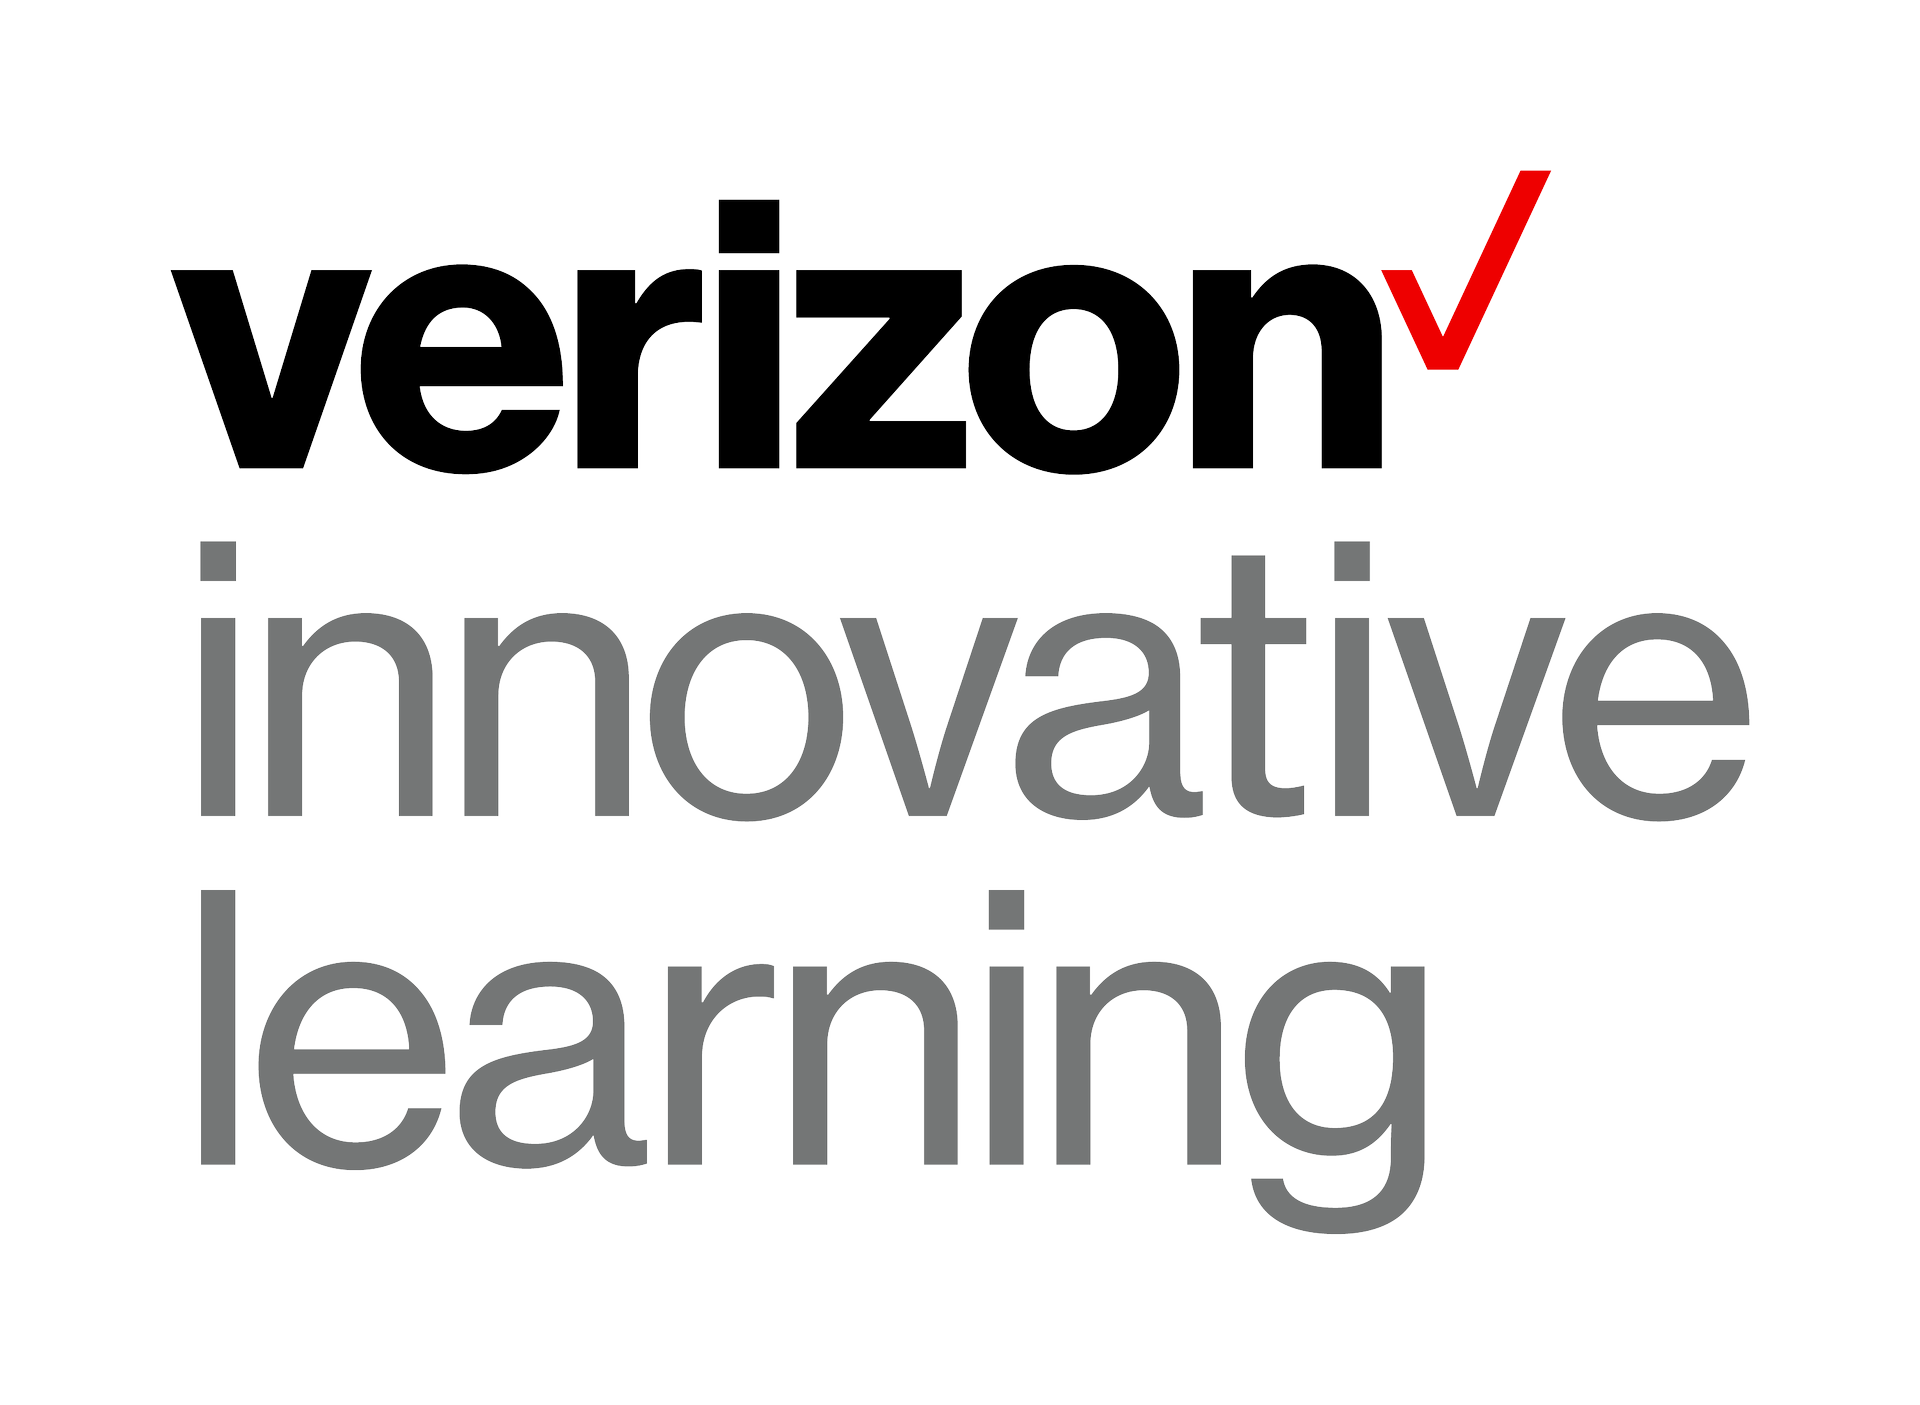 Verizon Innovative Learning logo